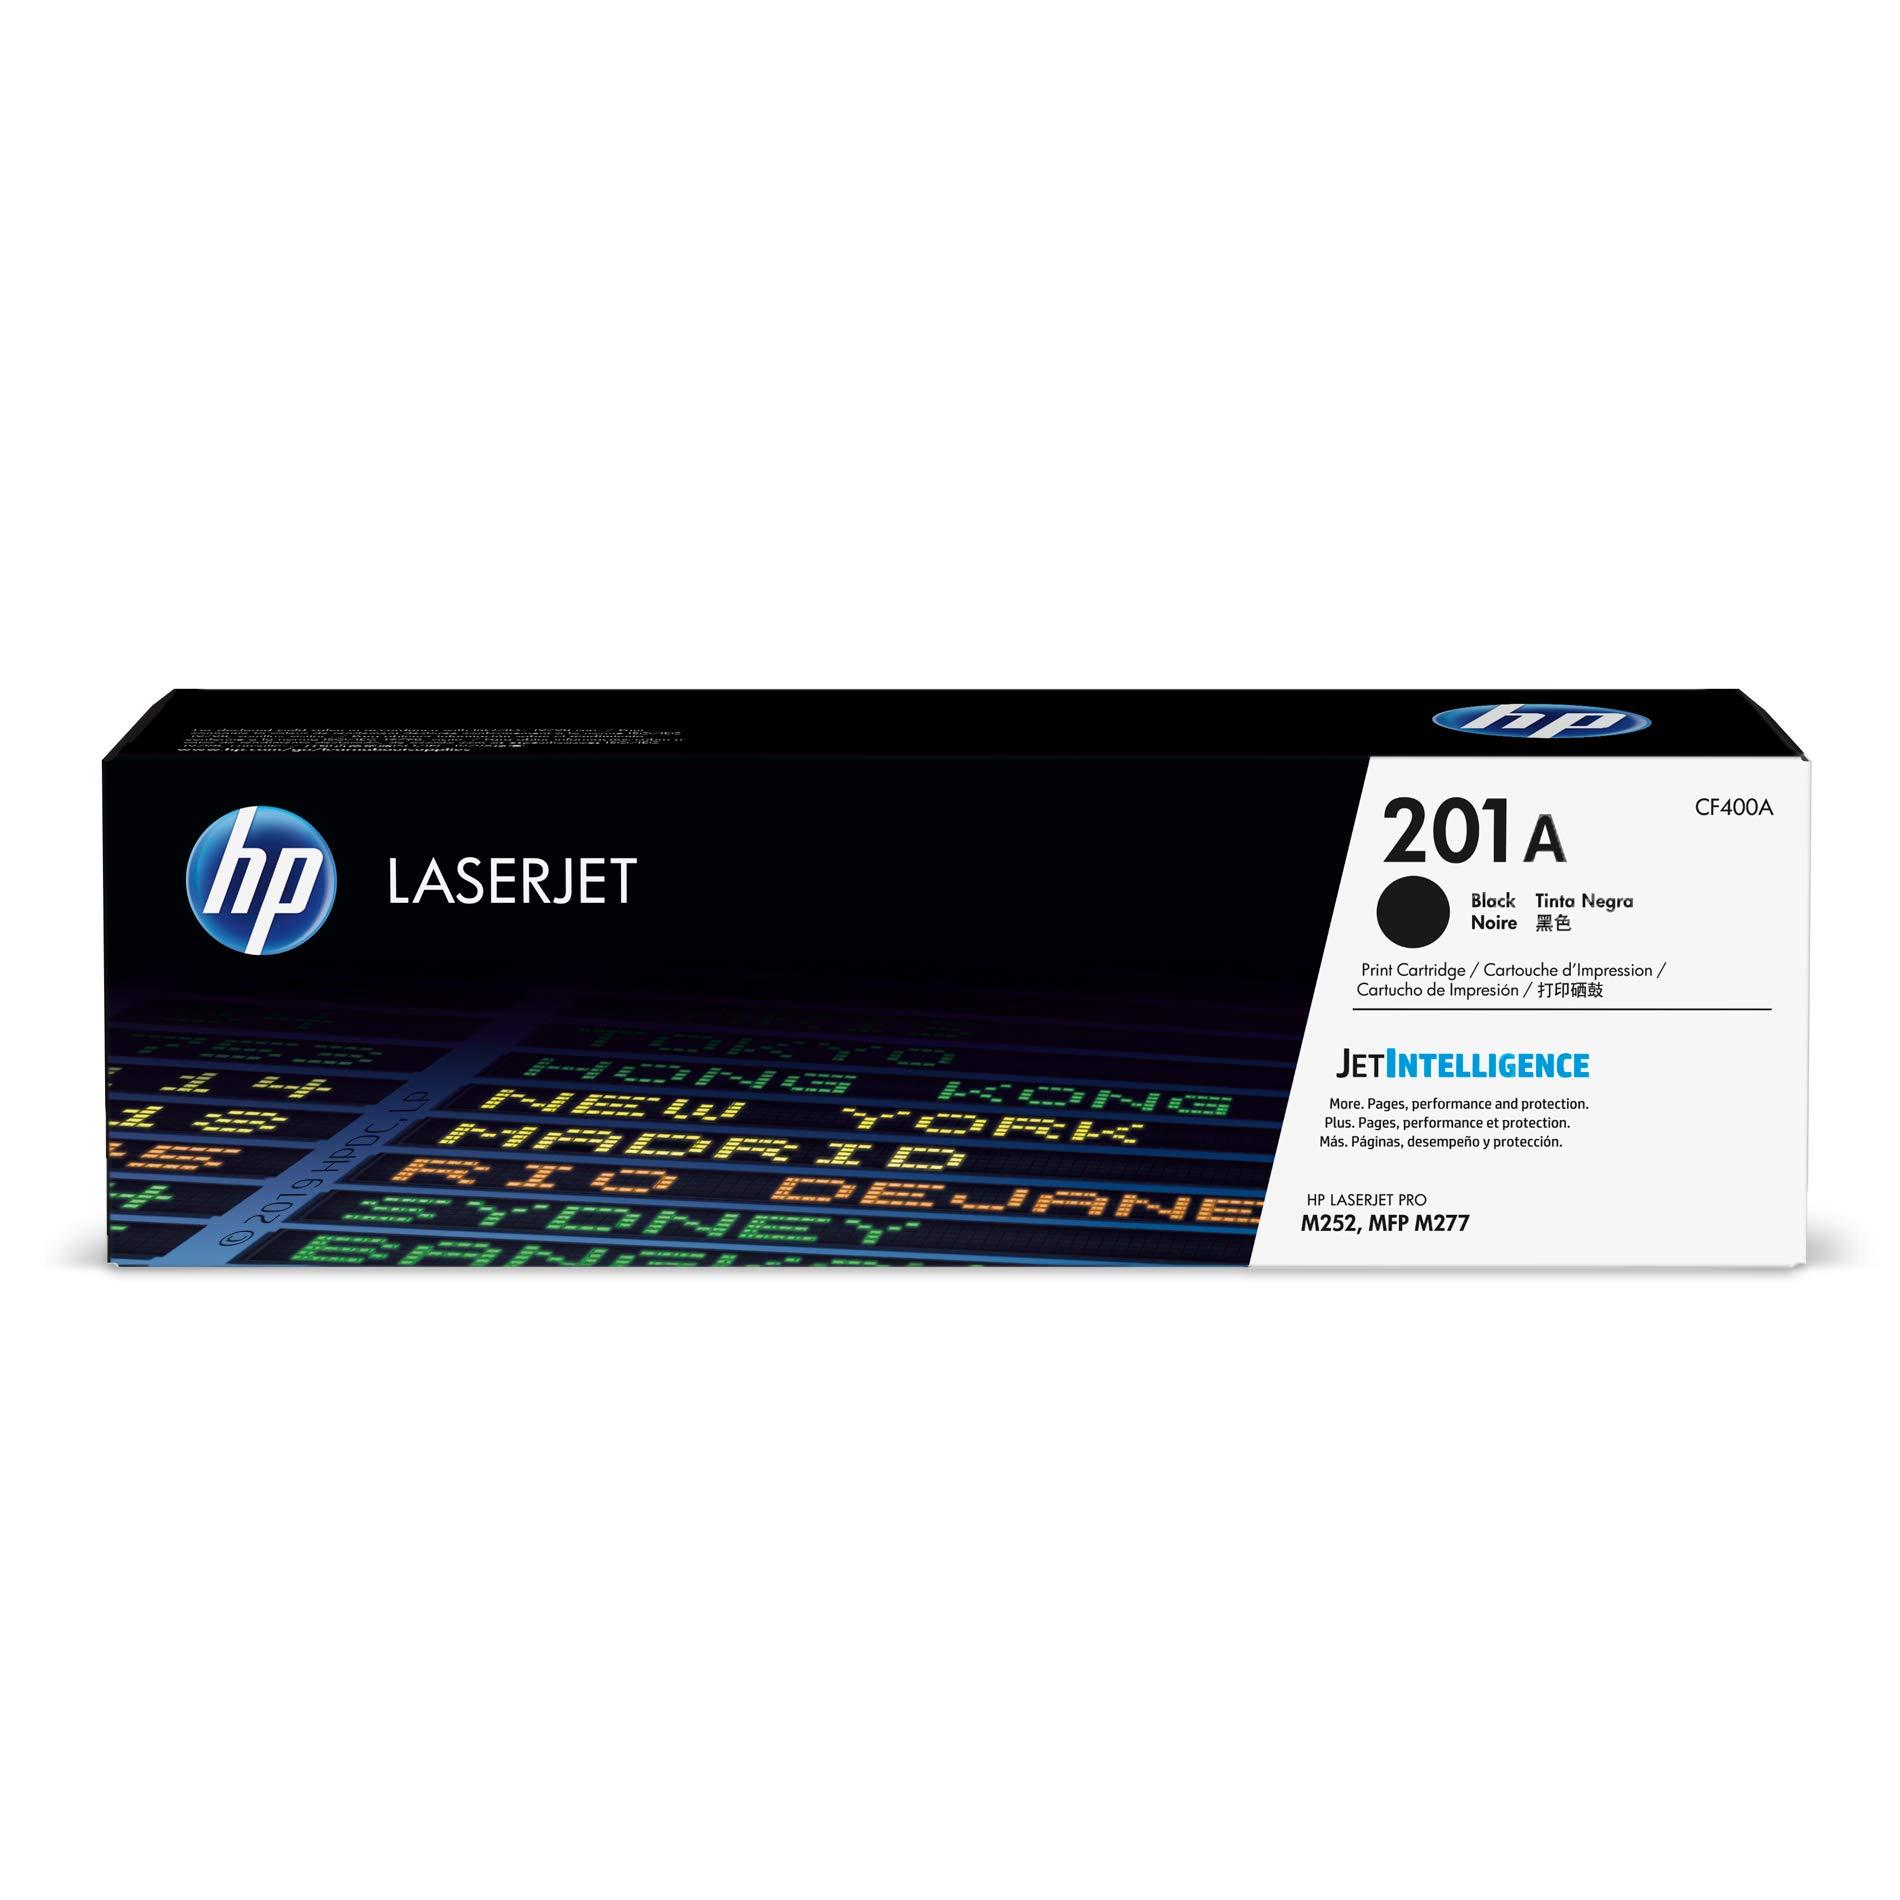 HP 201A | CF400A | Toner Cartridge | Works with HP Color Laserjet Pro M252dw, M277 Series | Black